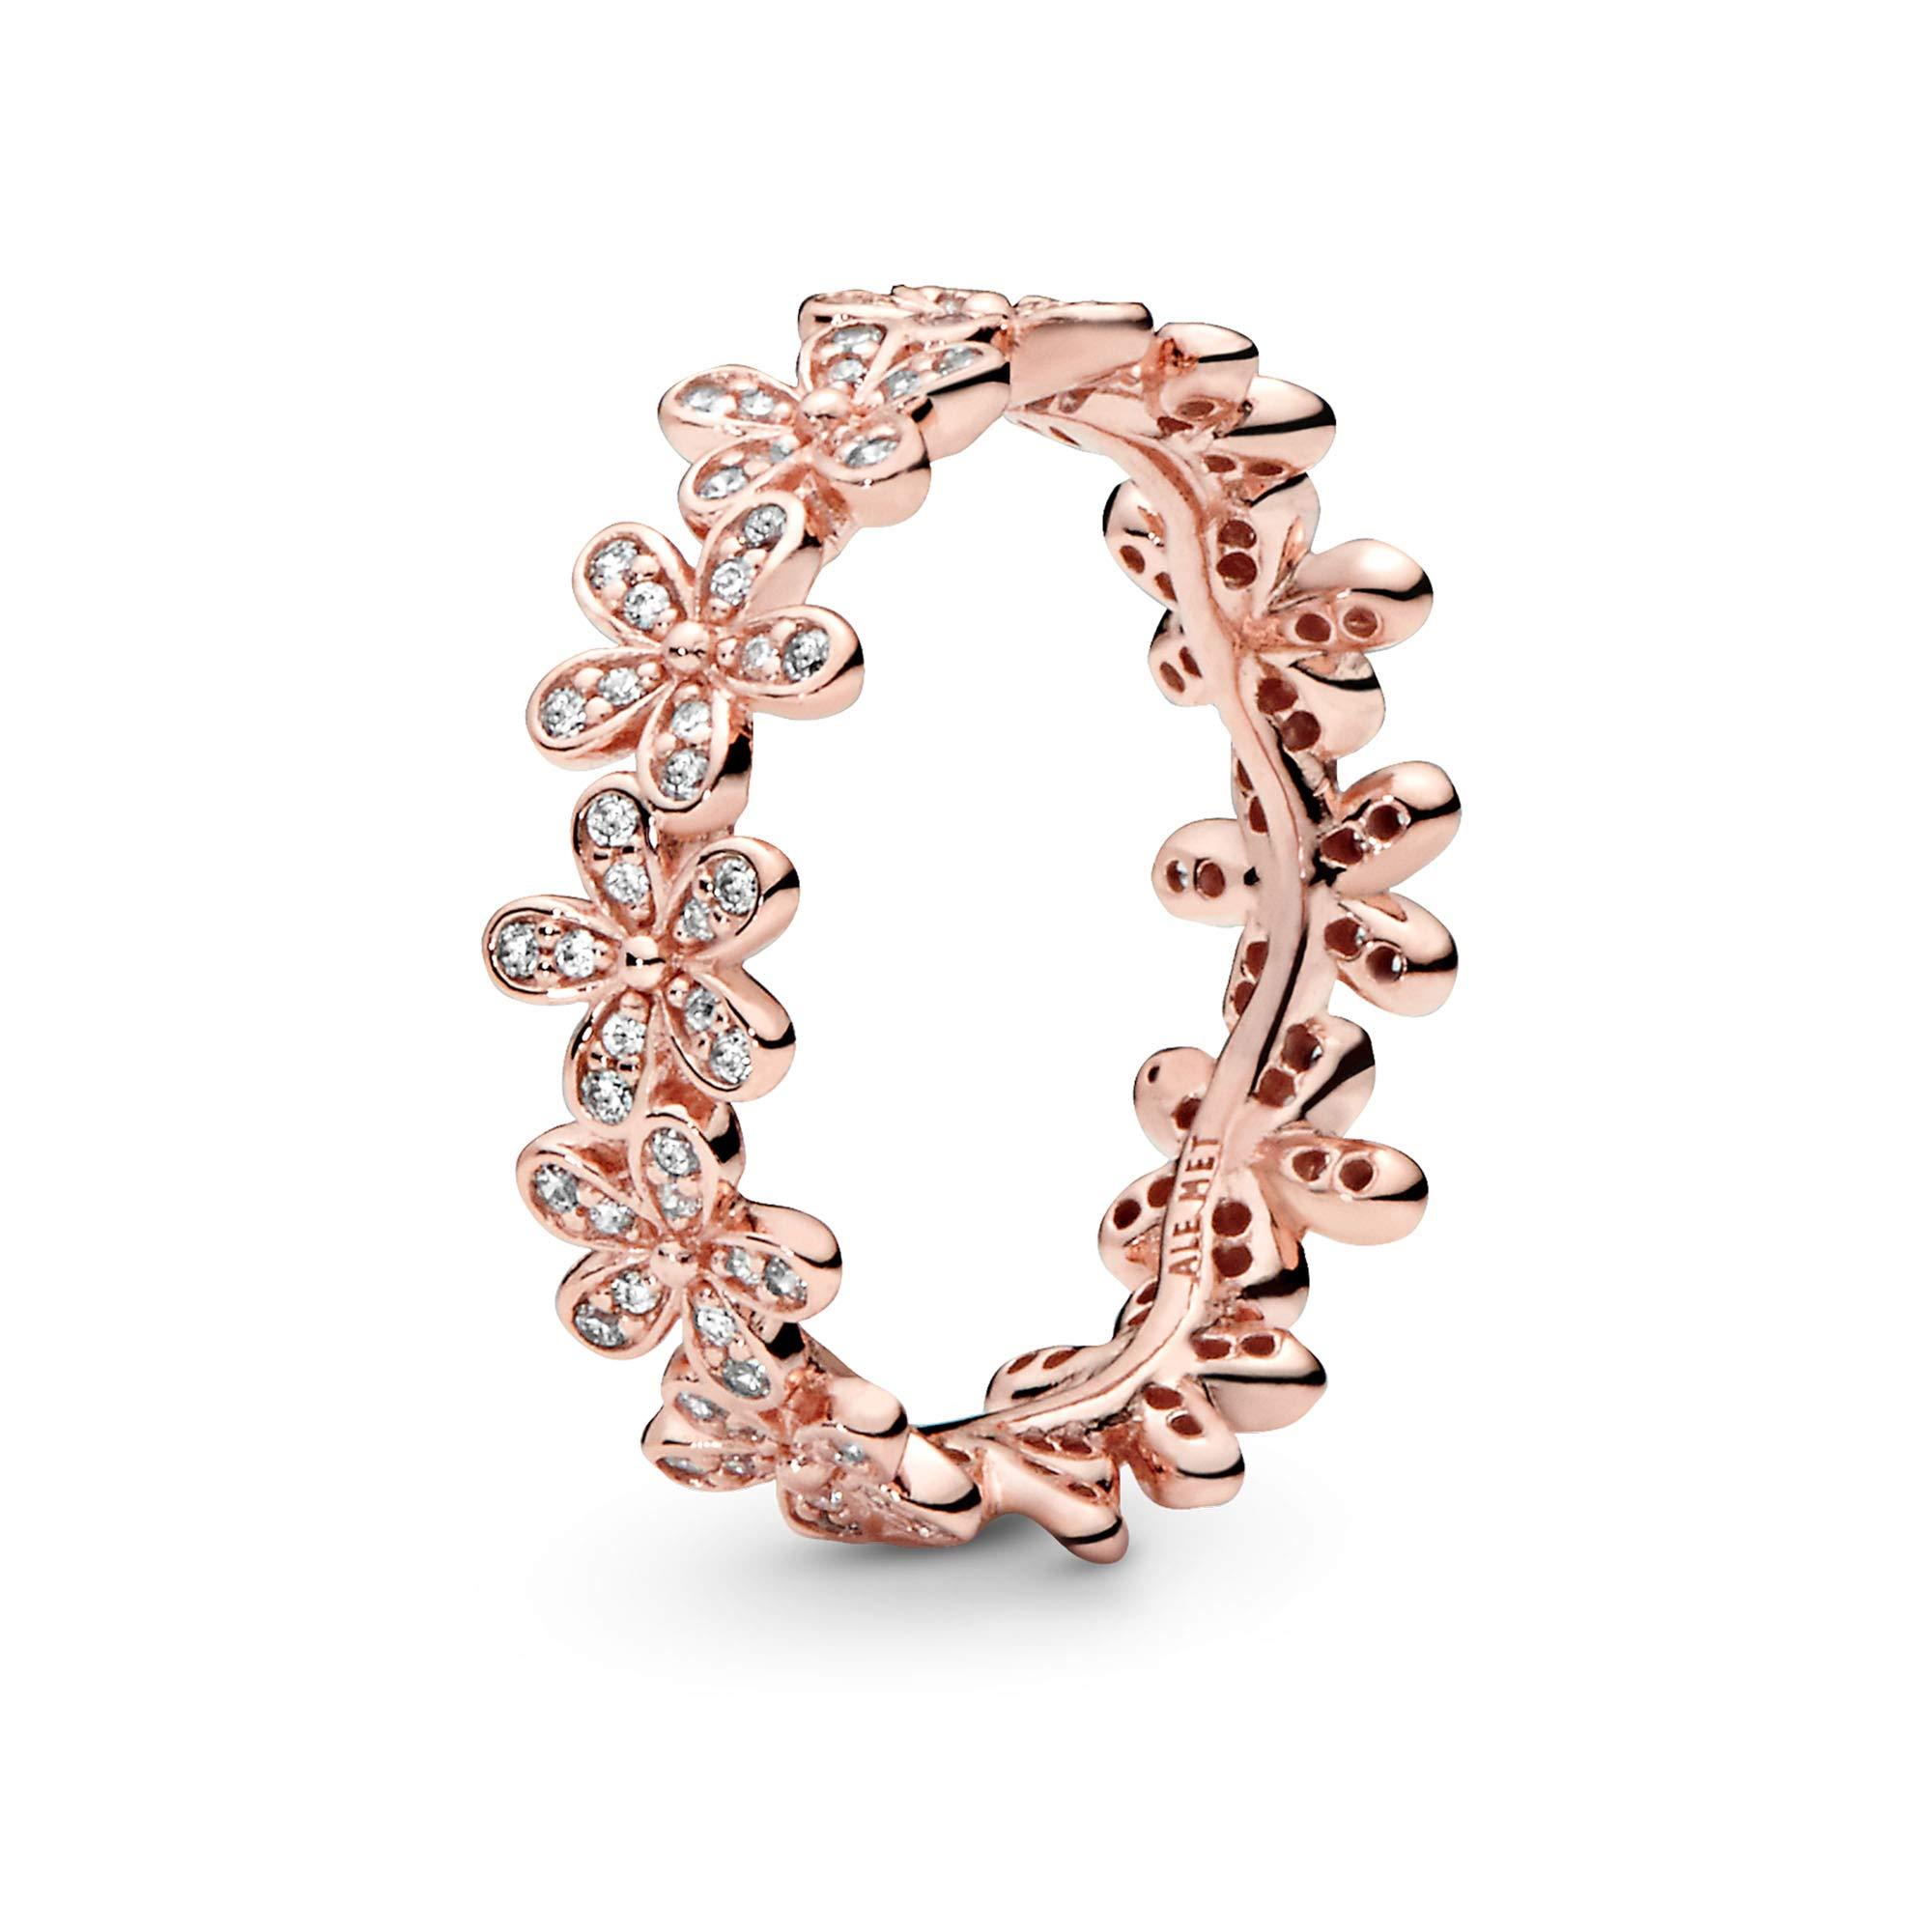 Pandora Jewelry Daisy Flower Cubic Zirconia Ring in Pandora Rose, Size 6